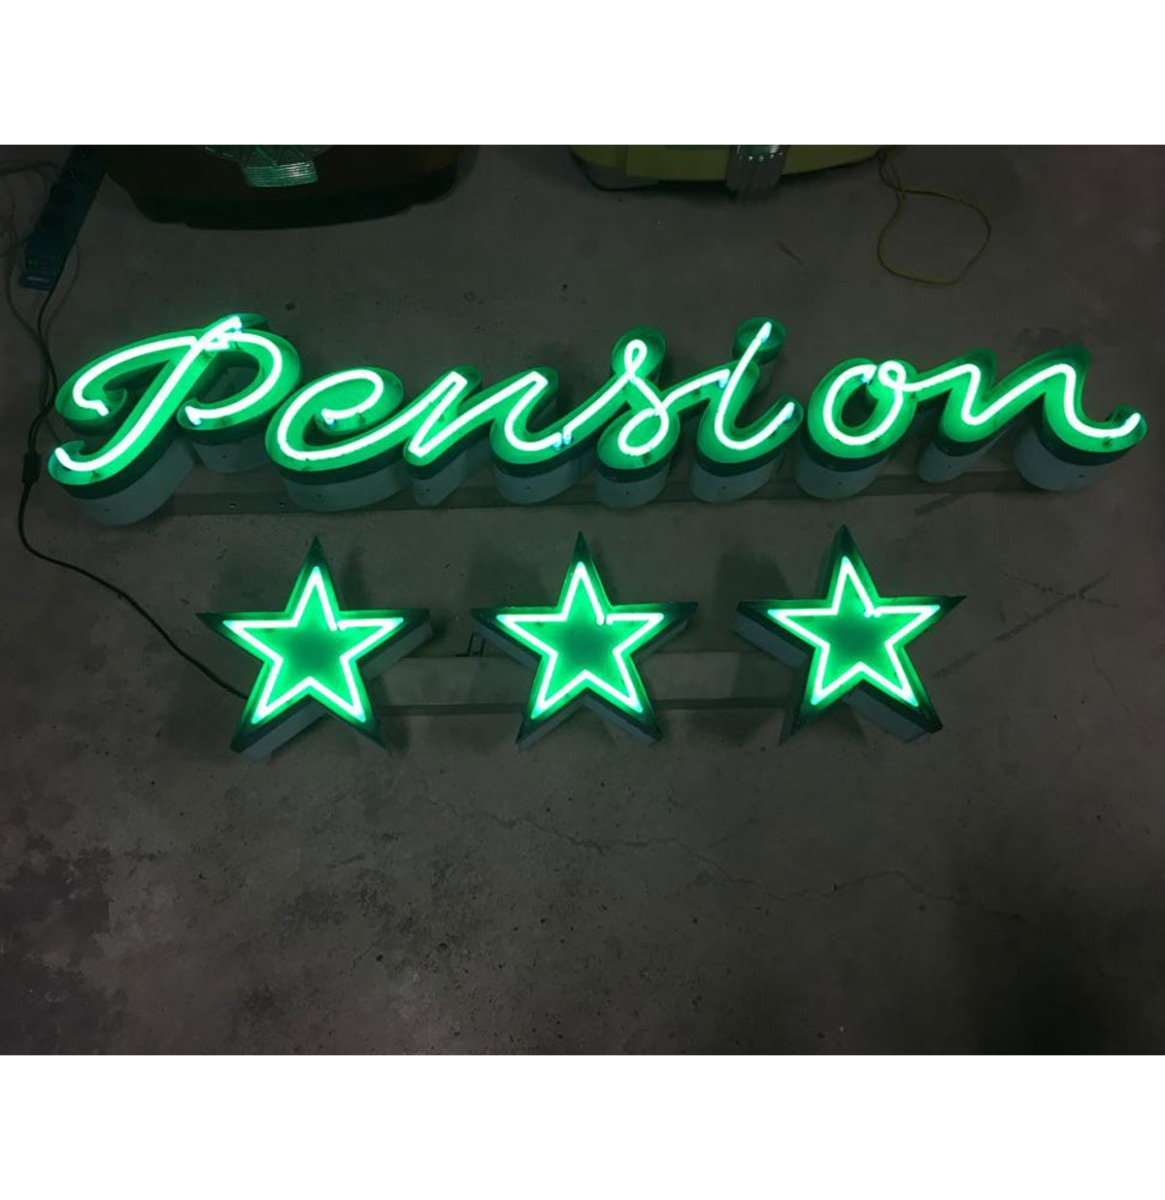 Pension & 3 Stars Neon Verlichting - Origineel